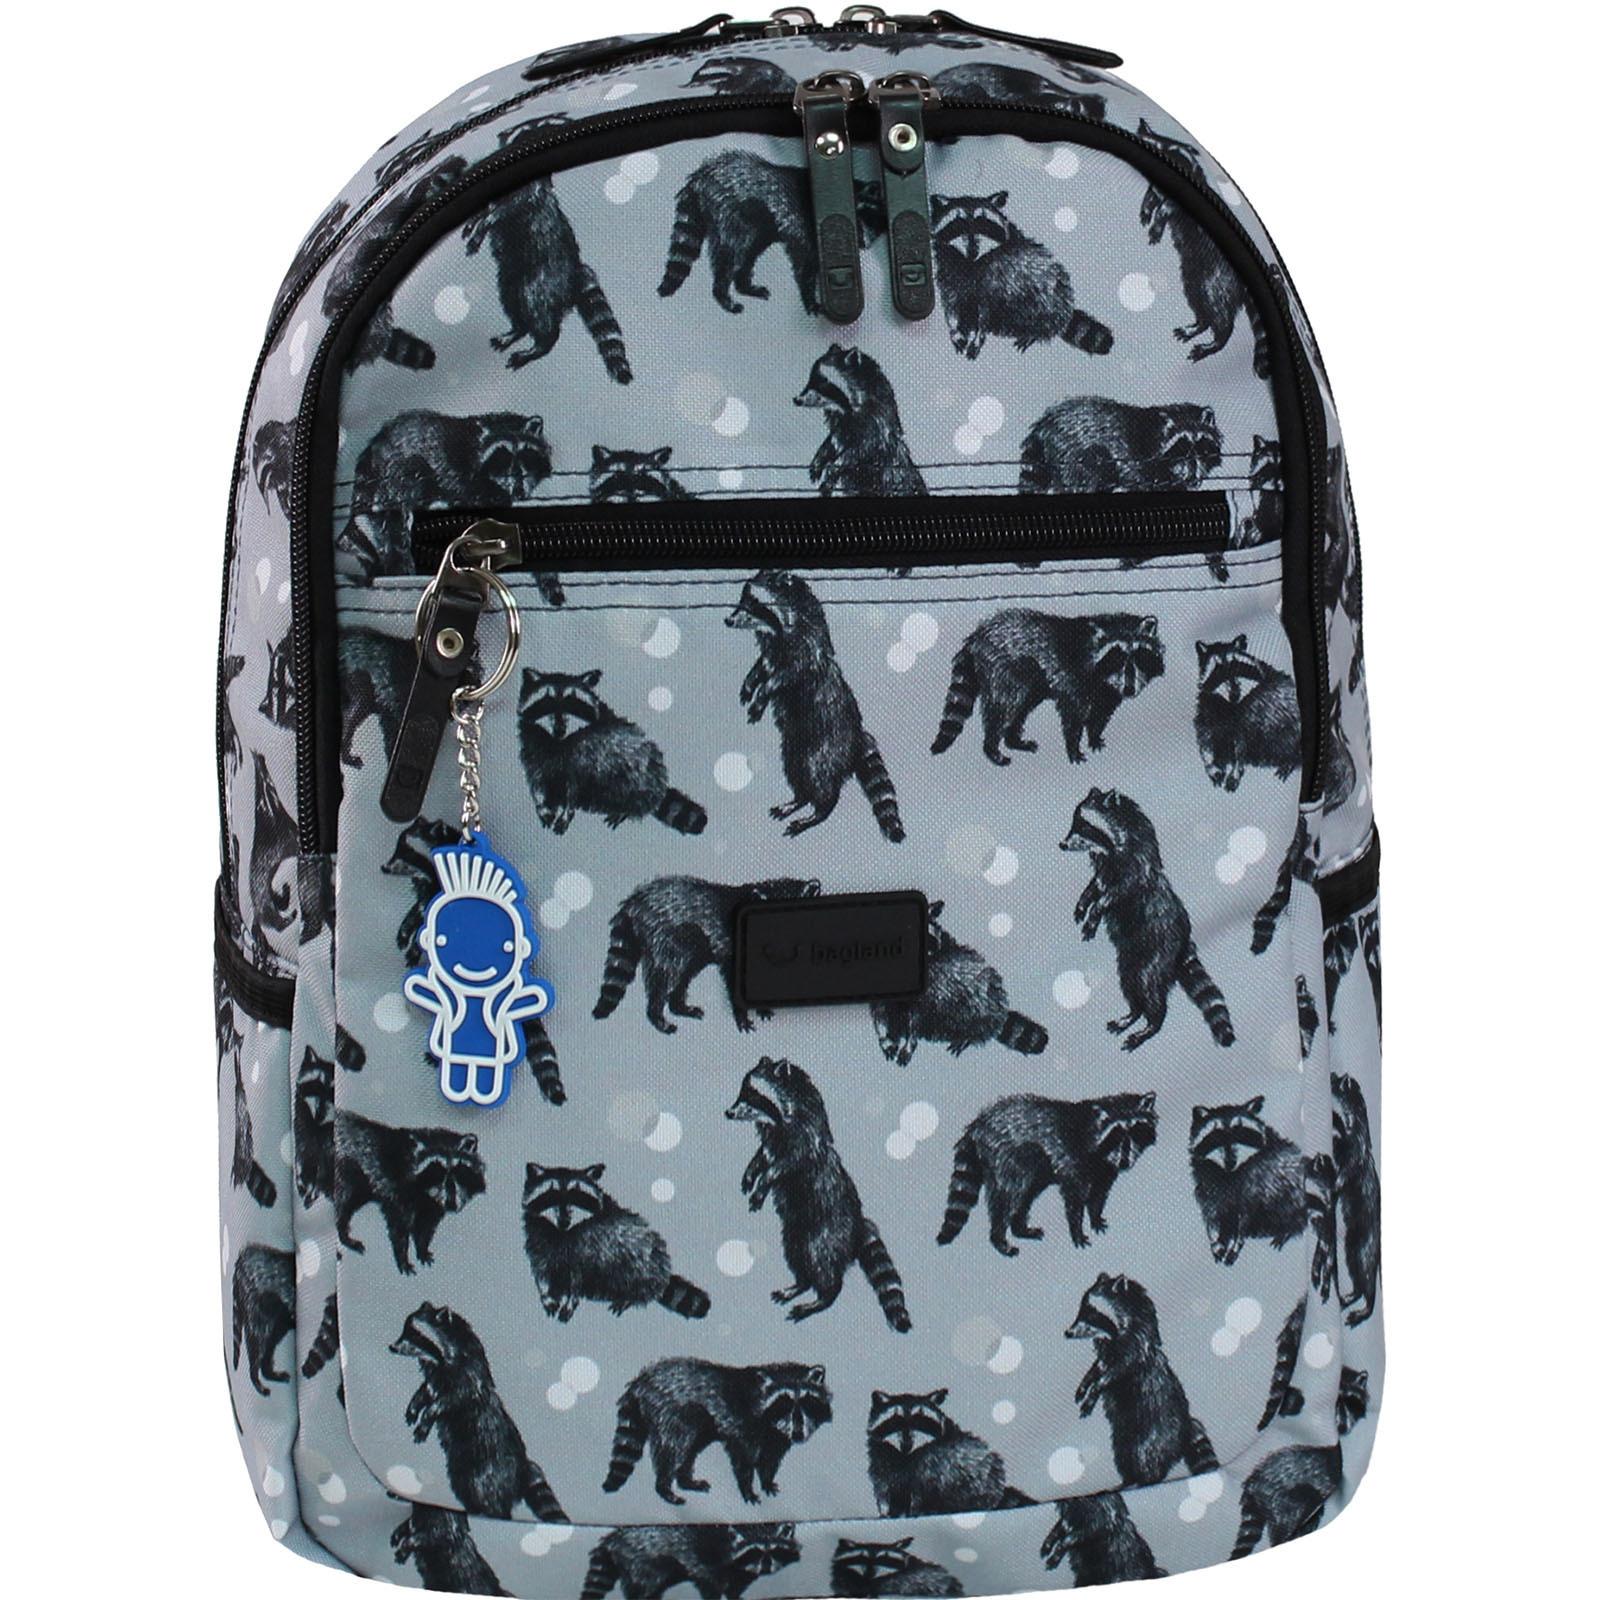 Детские рюкзаки Рюкзак Bagland Young 13 л. сублімація 356 (00510664) IMG_8737_356.JPG